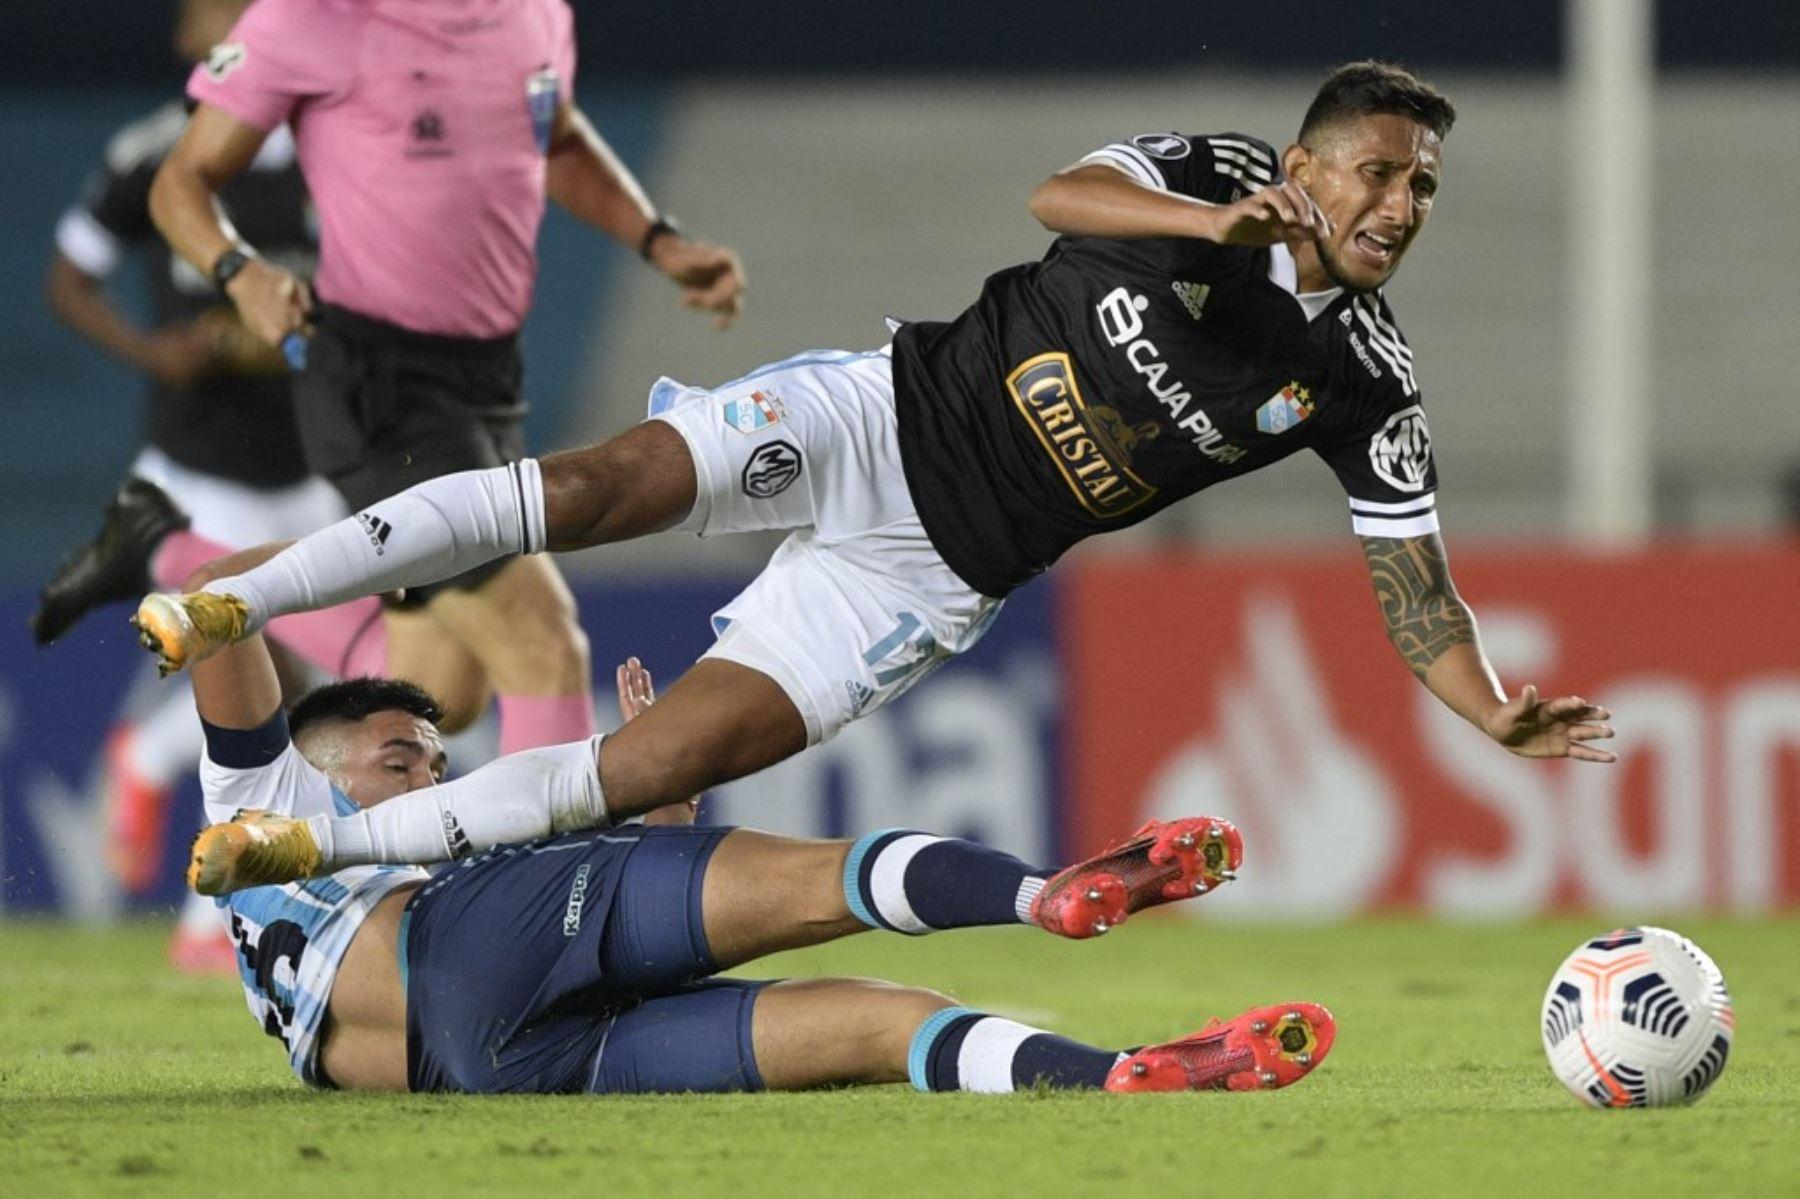 Cristal cayó 2-1 ante el Racing en Avellaneda por el Grupo E de la Copa Libertadores